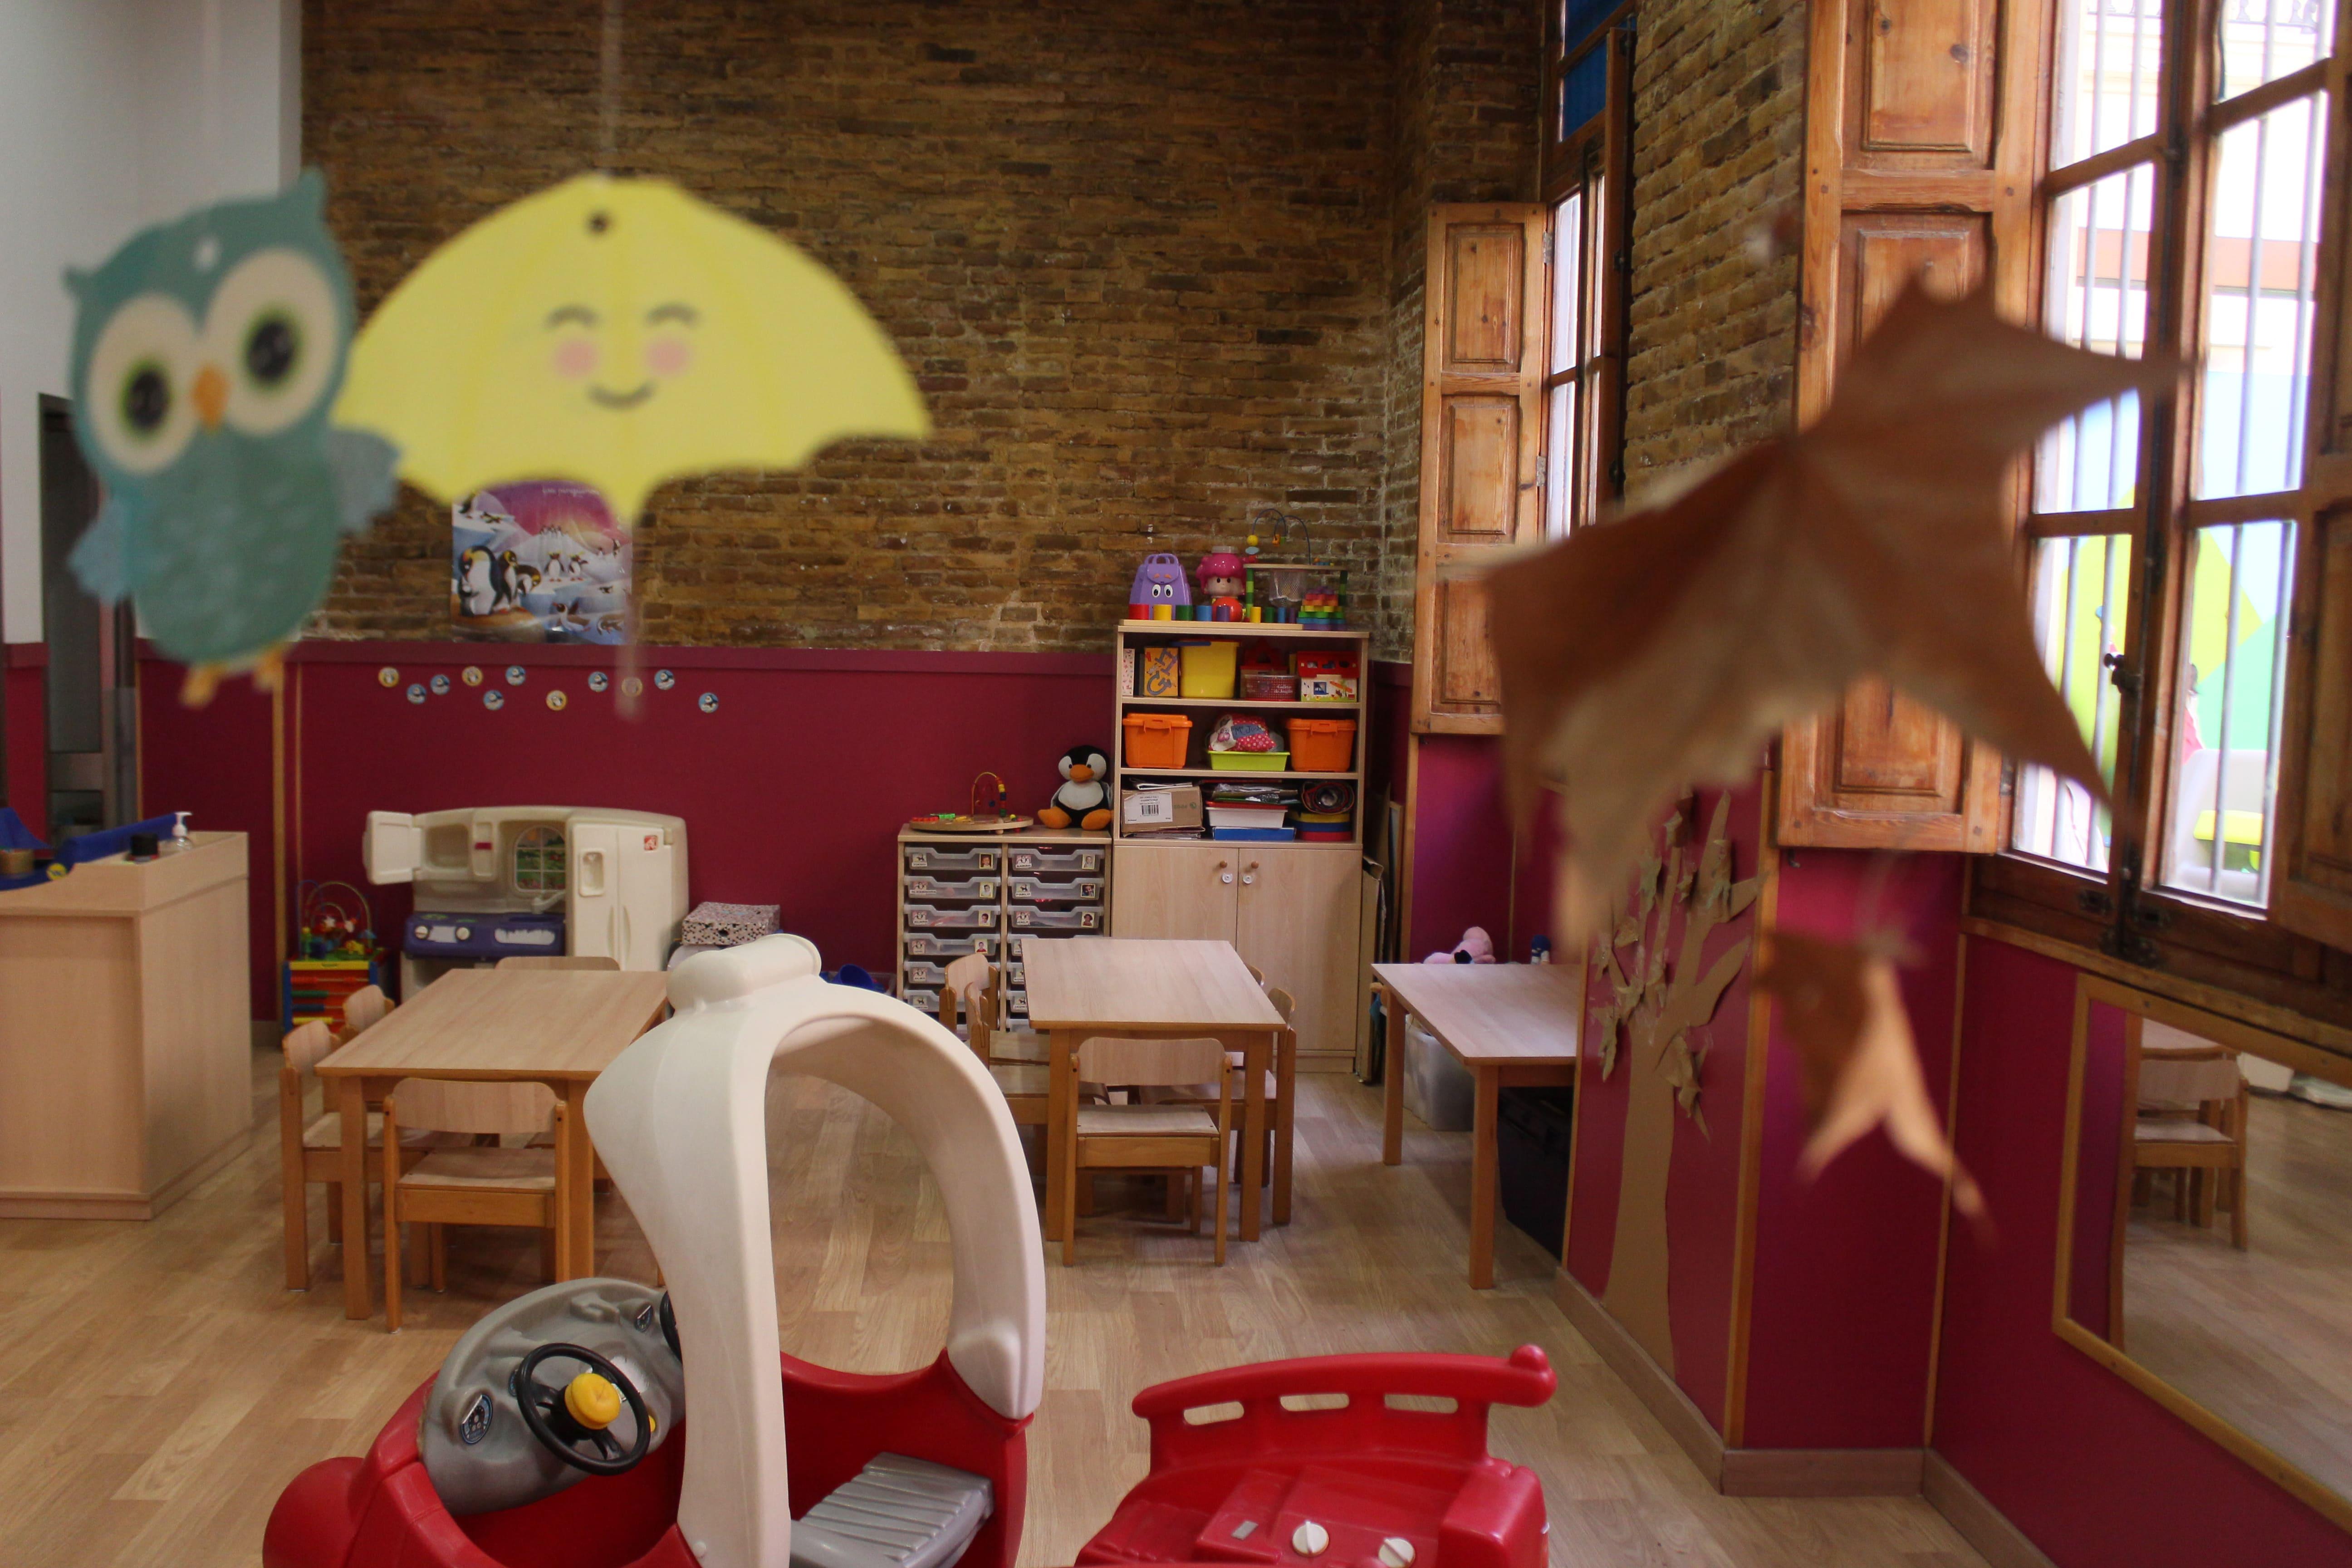 escuela infantil bilingüe en Valencia - clase por dentro